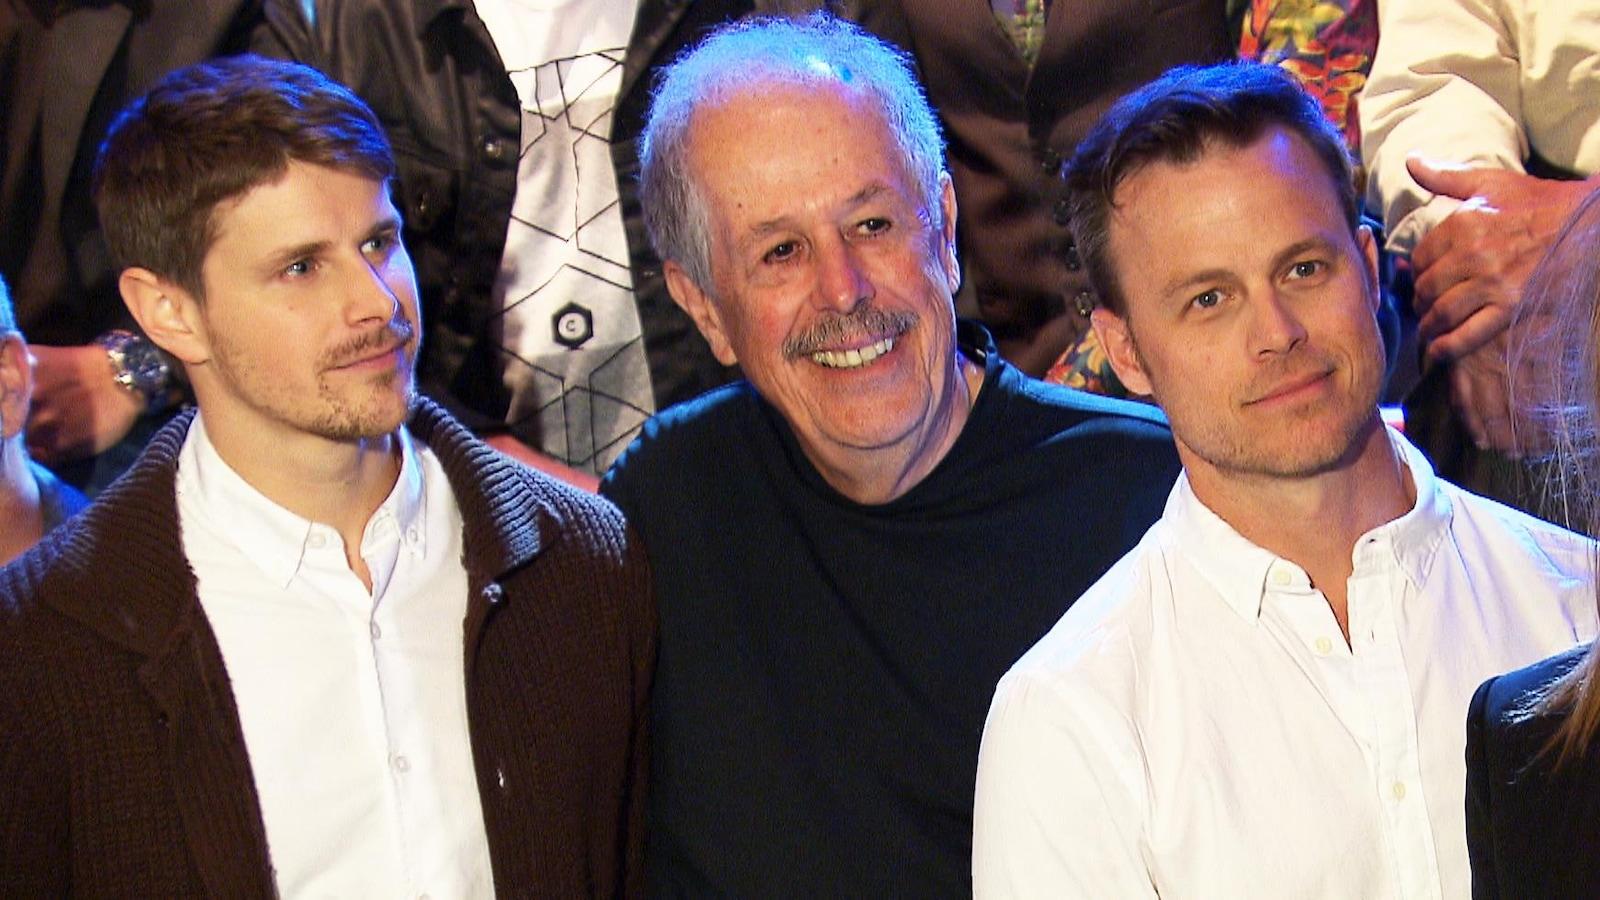 Alexandre Landry, Denys Arcand et Louis Morissette